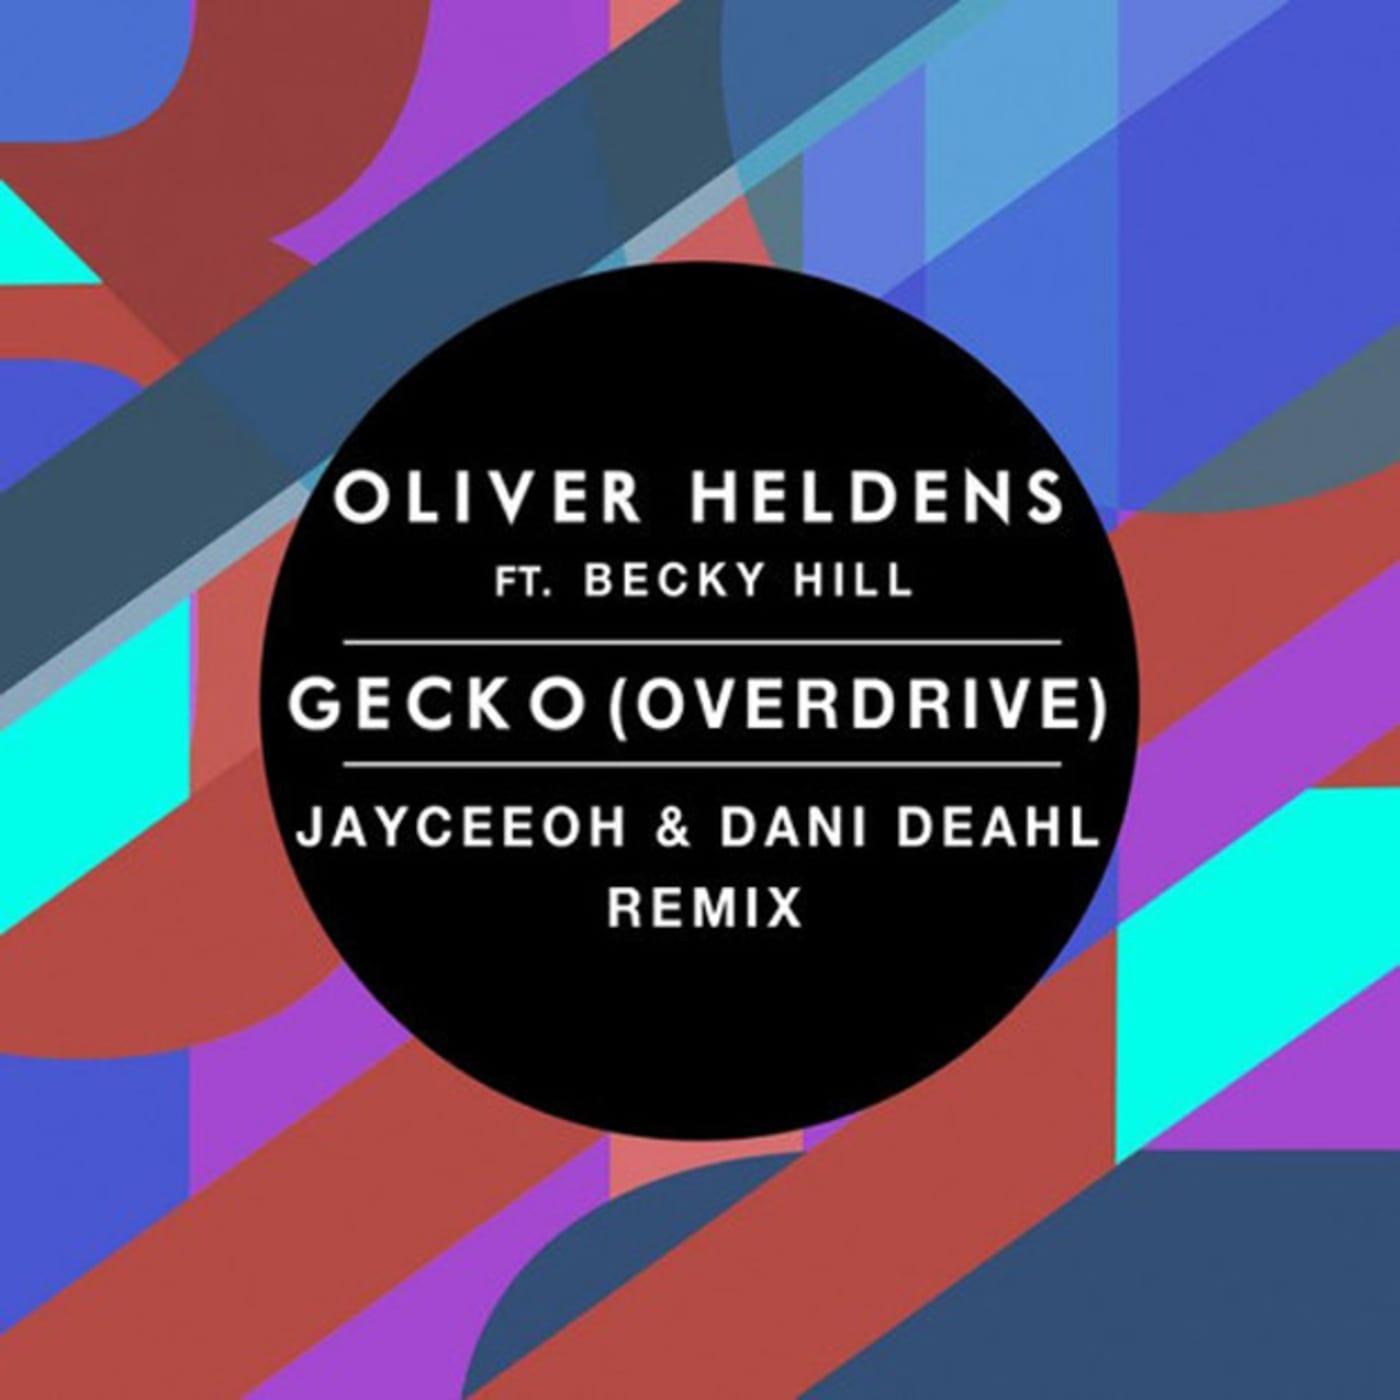 gecko overdrive jayceeoh dani deahl remix